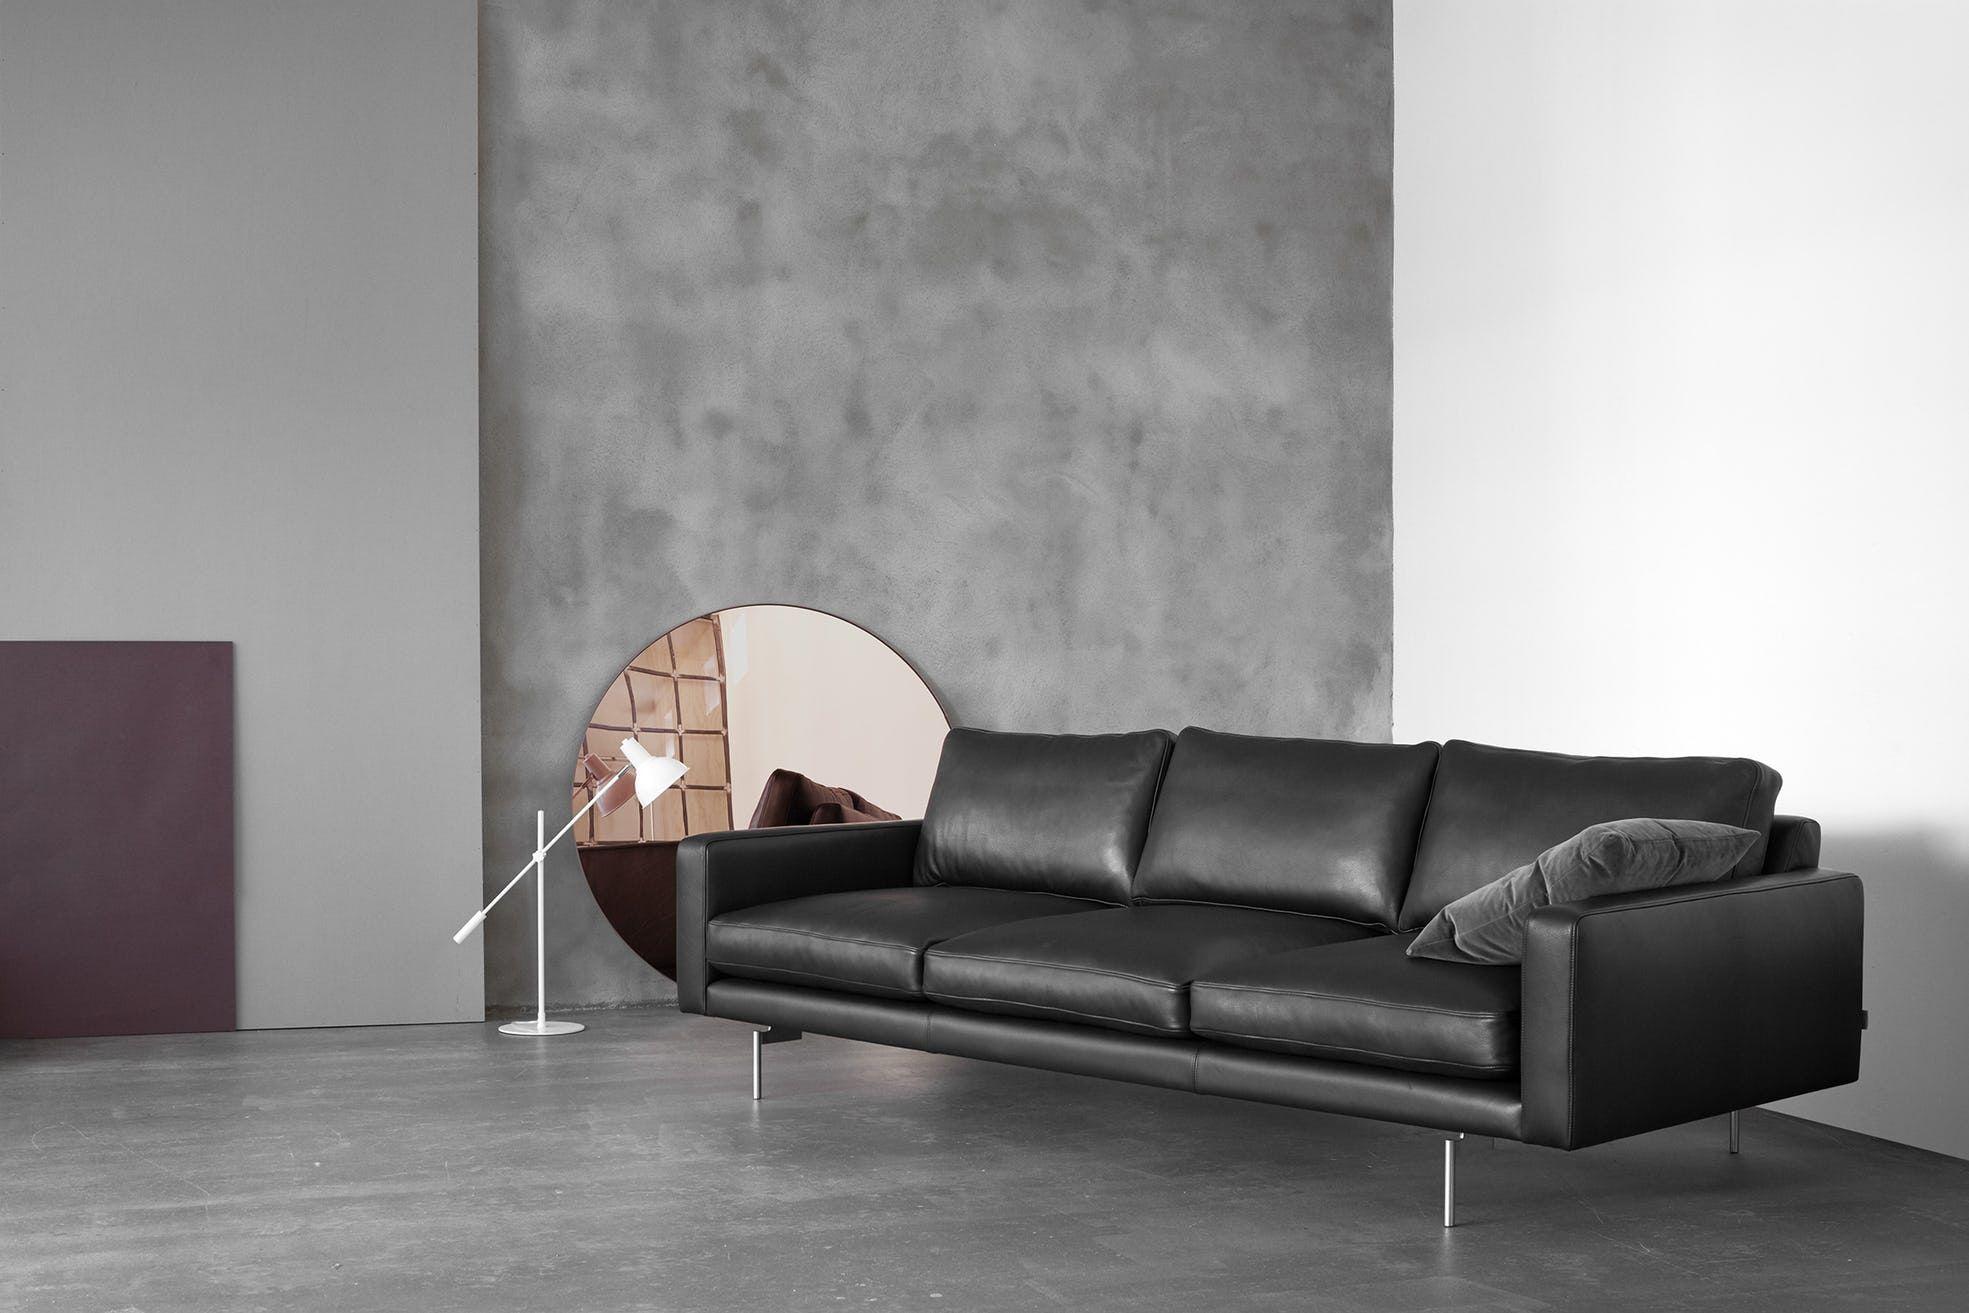 Edge 1 Sofa By Wendelbo Furniture Sofa Sofa Design